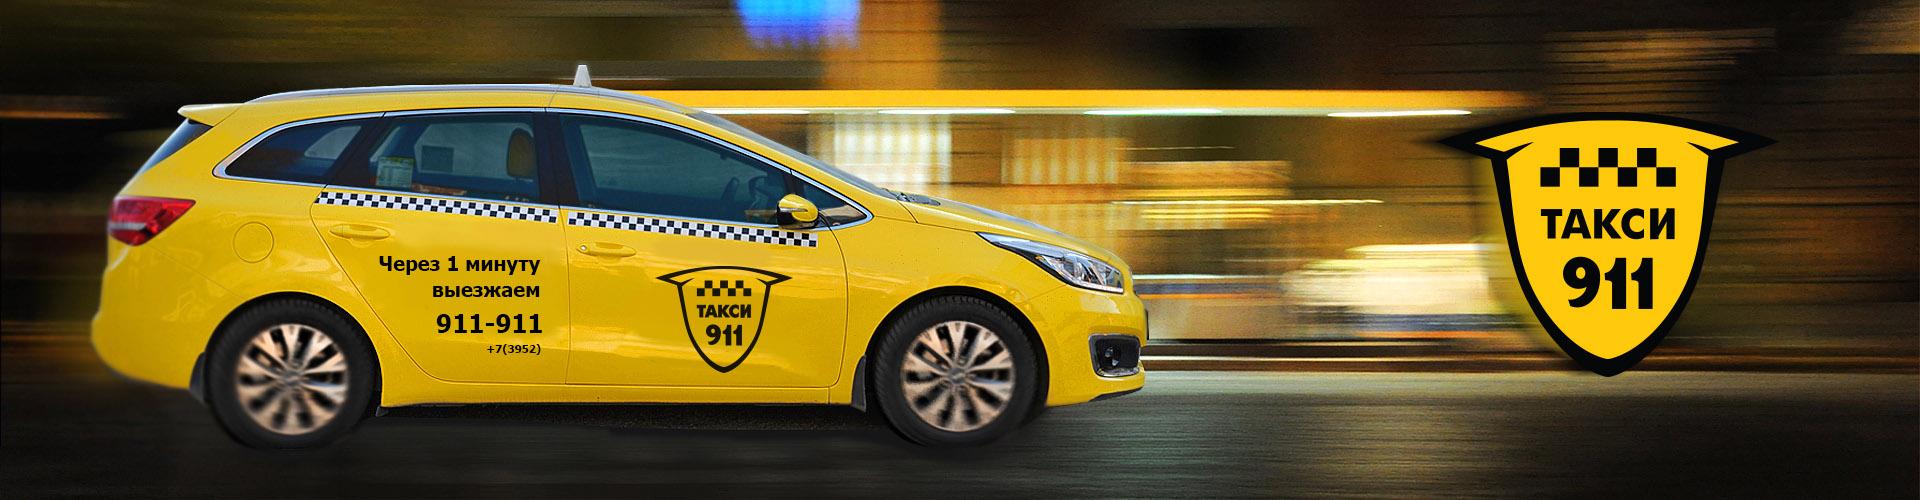 Logo службы такси